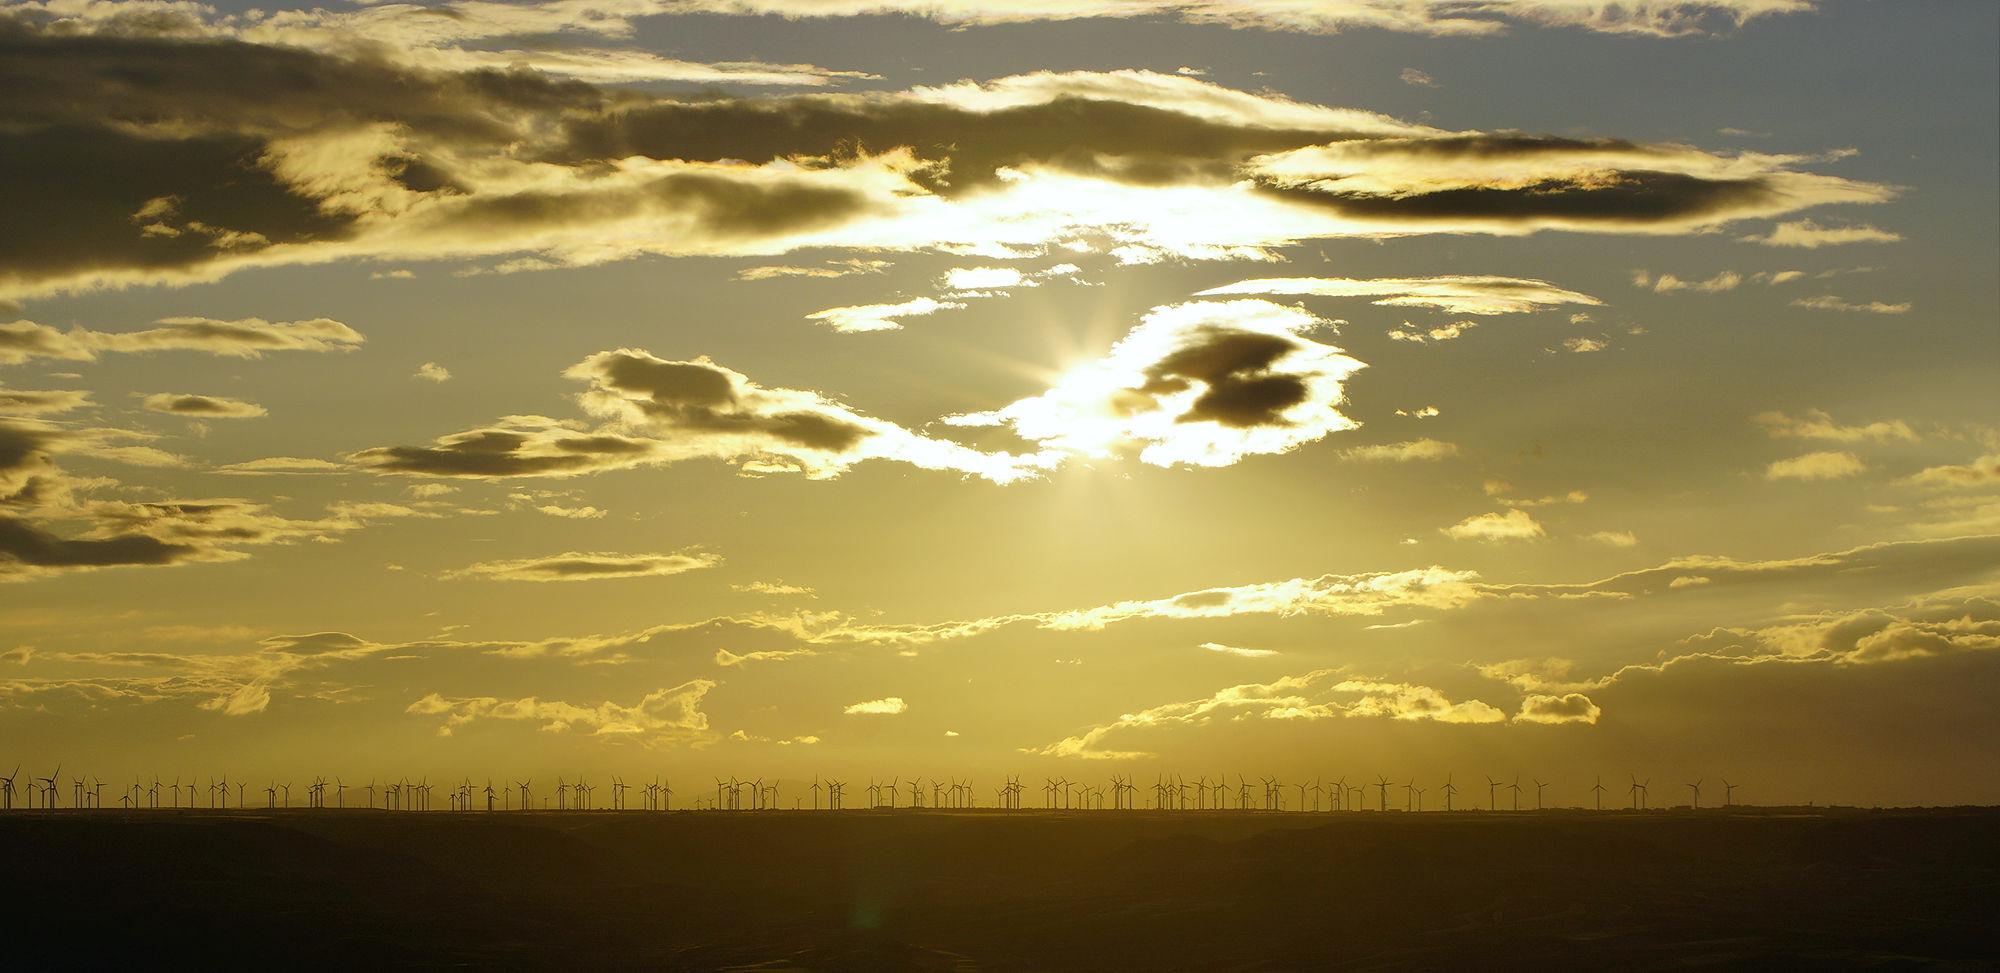 * etwas später ~ Zählbild mit Windturbinen II *